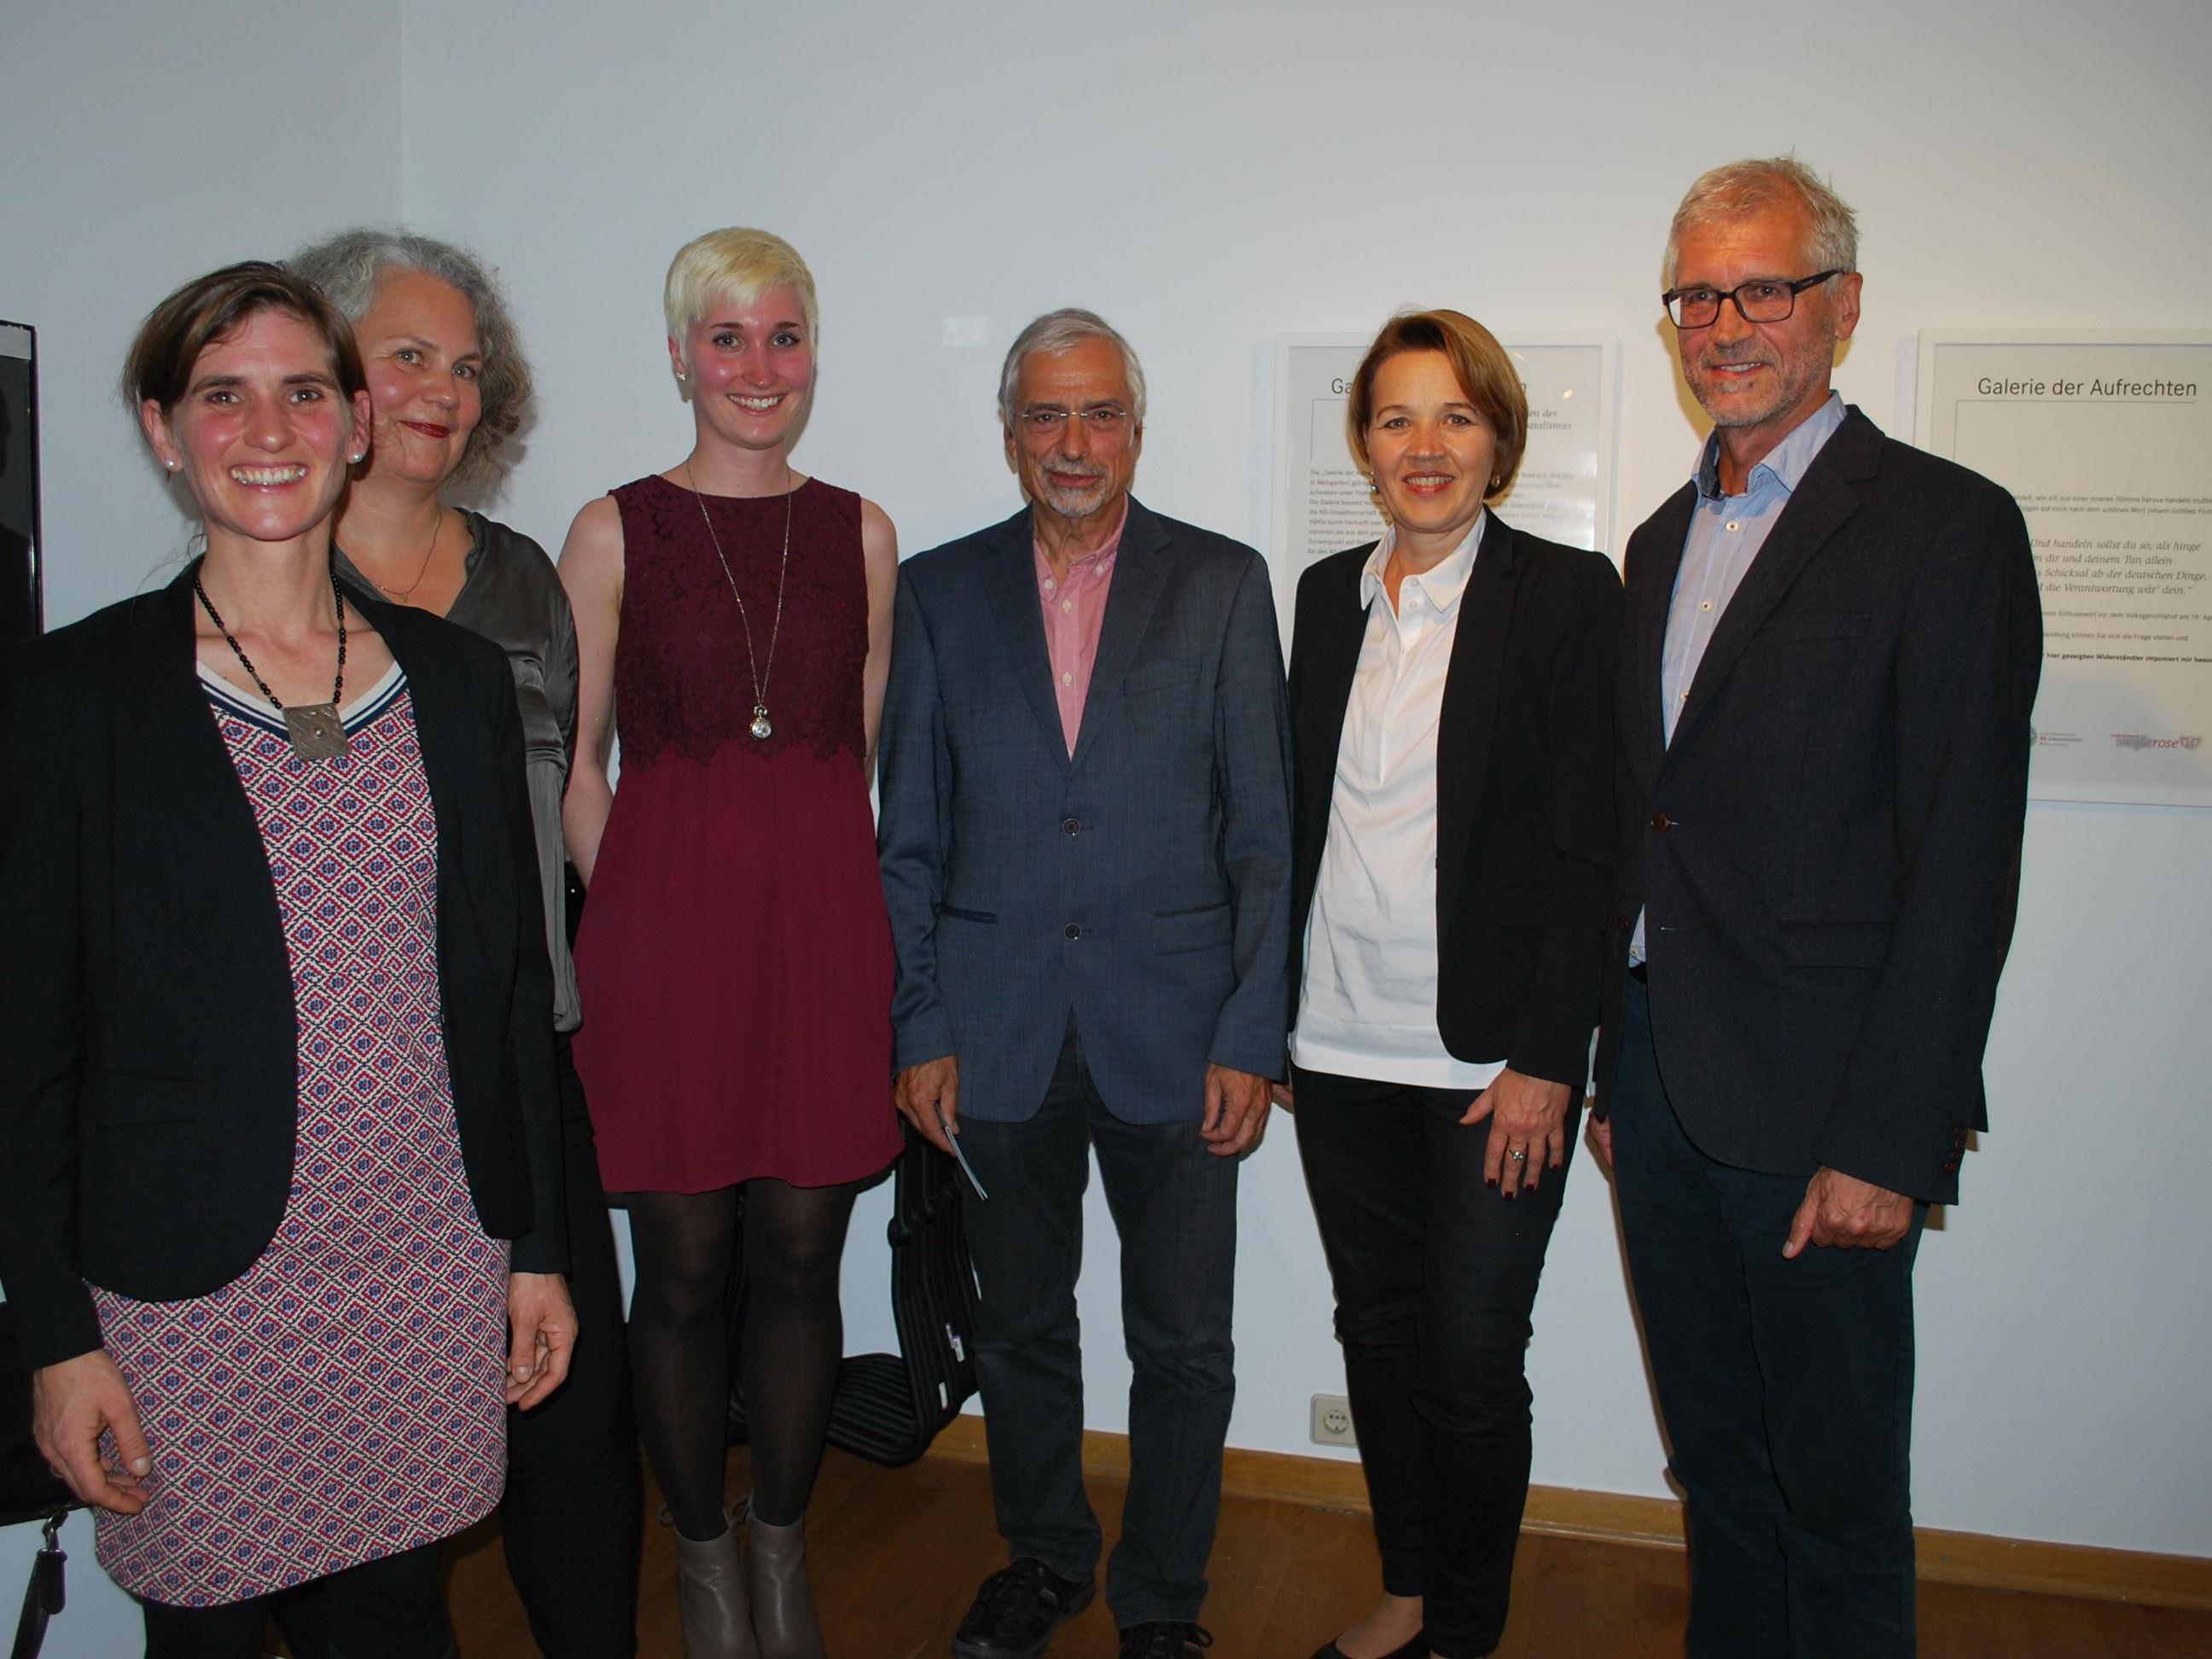 Antje Wagner, Petra Zudrell, Atessa Sonntag, Uwe Hertrampf, Andrea Kaufmann, Harald Walser (vl)